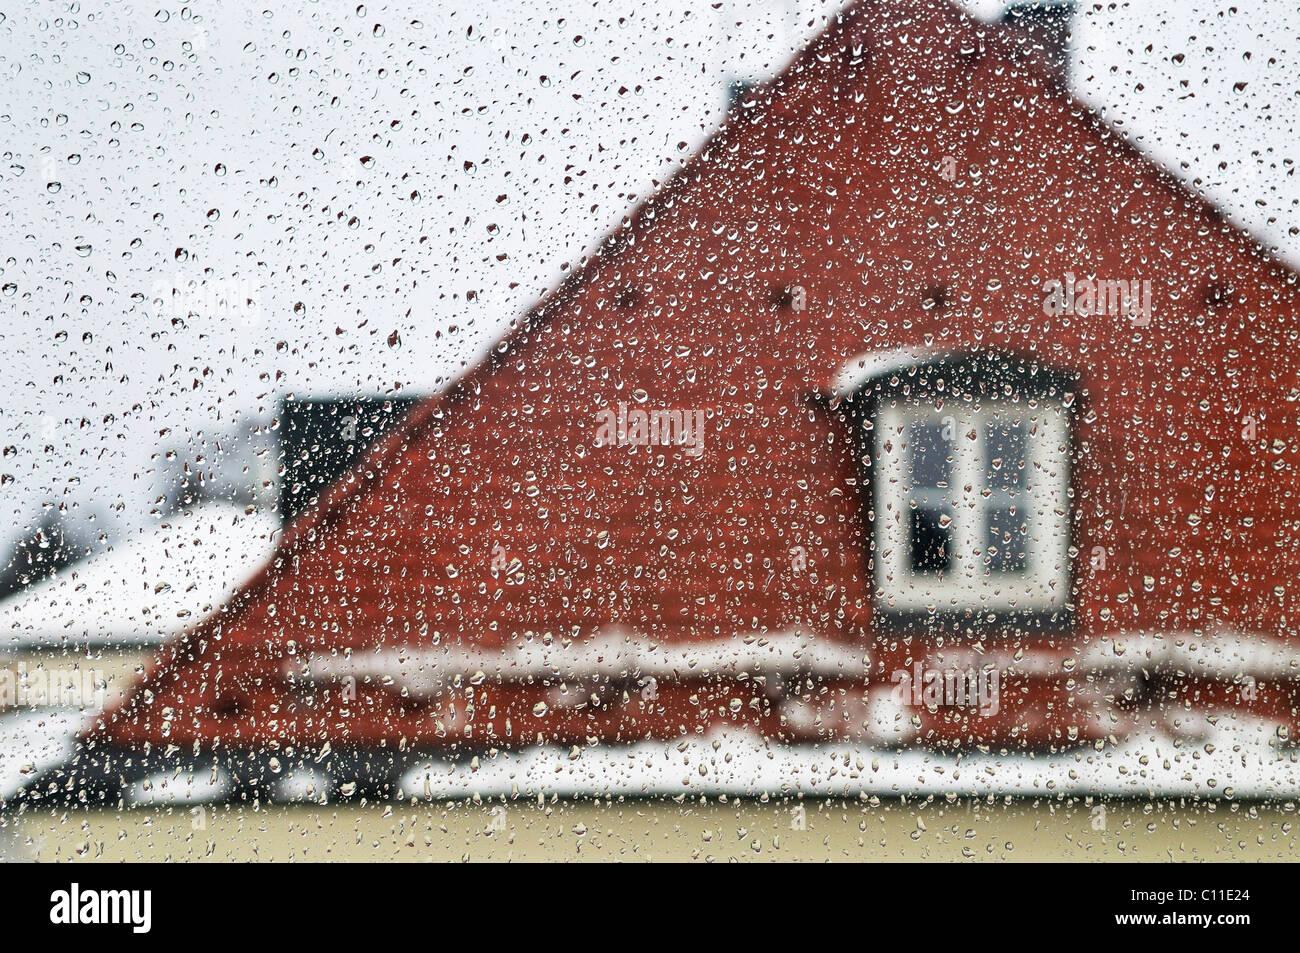 Window with raindrops, Germany, Europe Stock Photo